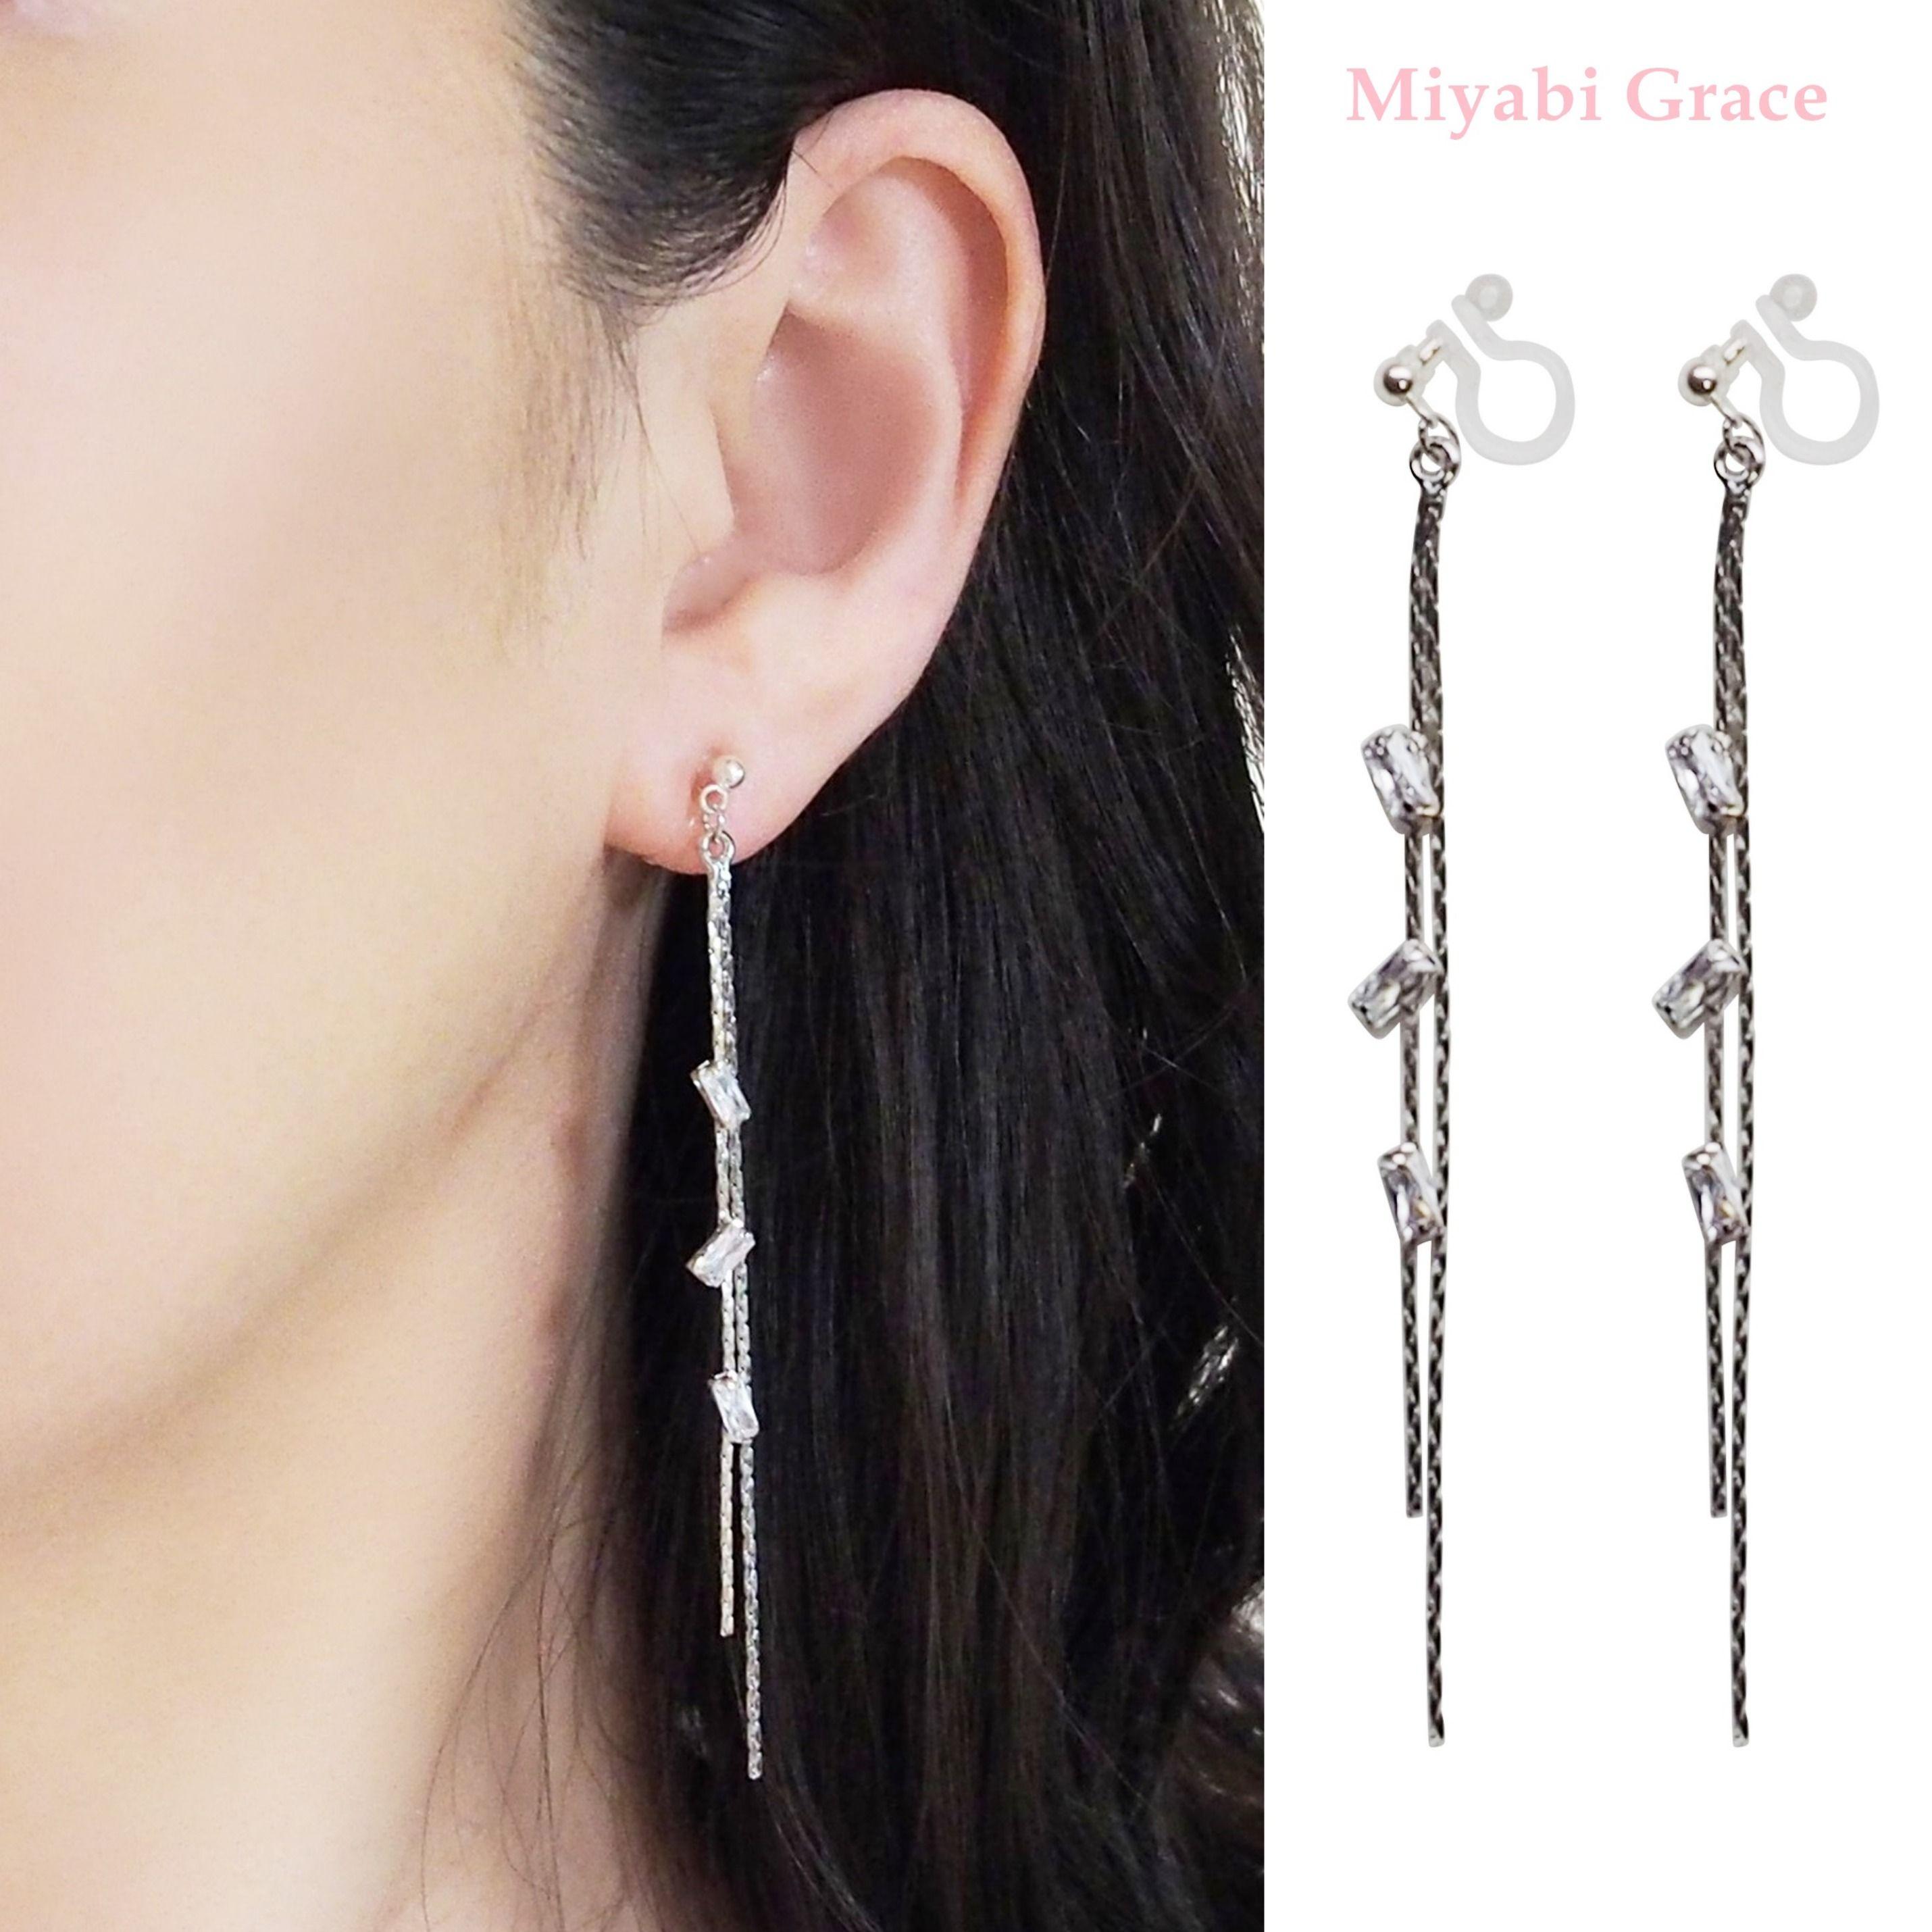 Pin on ミヤビグレース Miyabi Grace ノンホールピアス 樹脂